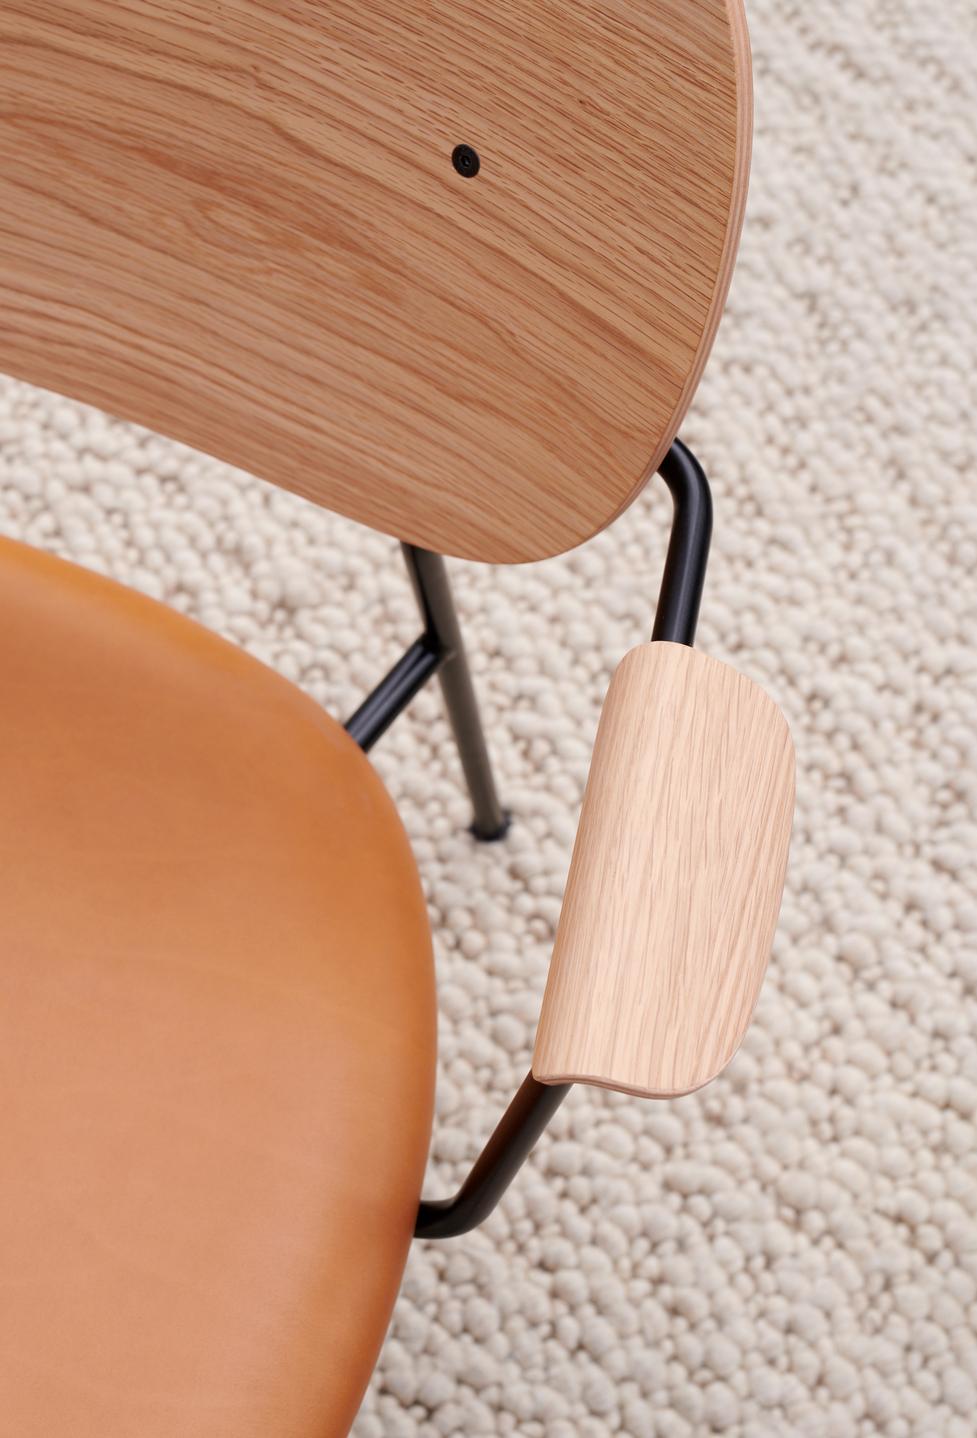 Co Lounge Chair by Menu  / via @kronekern